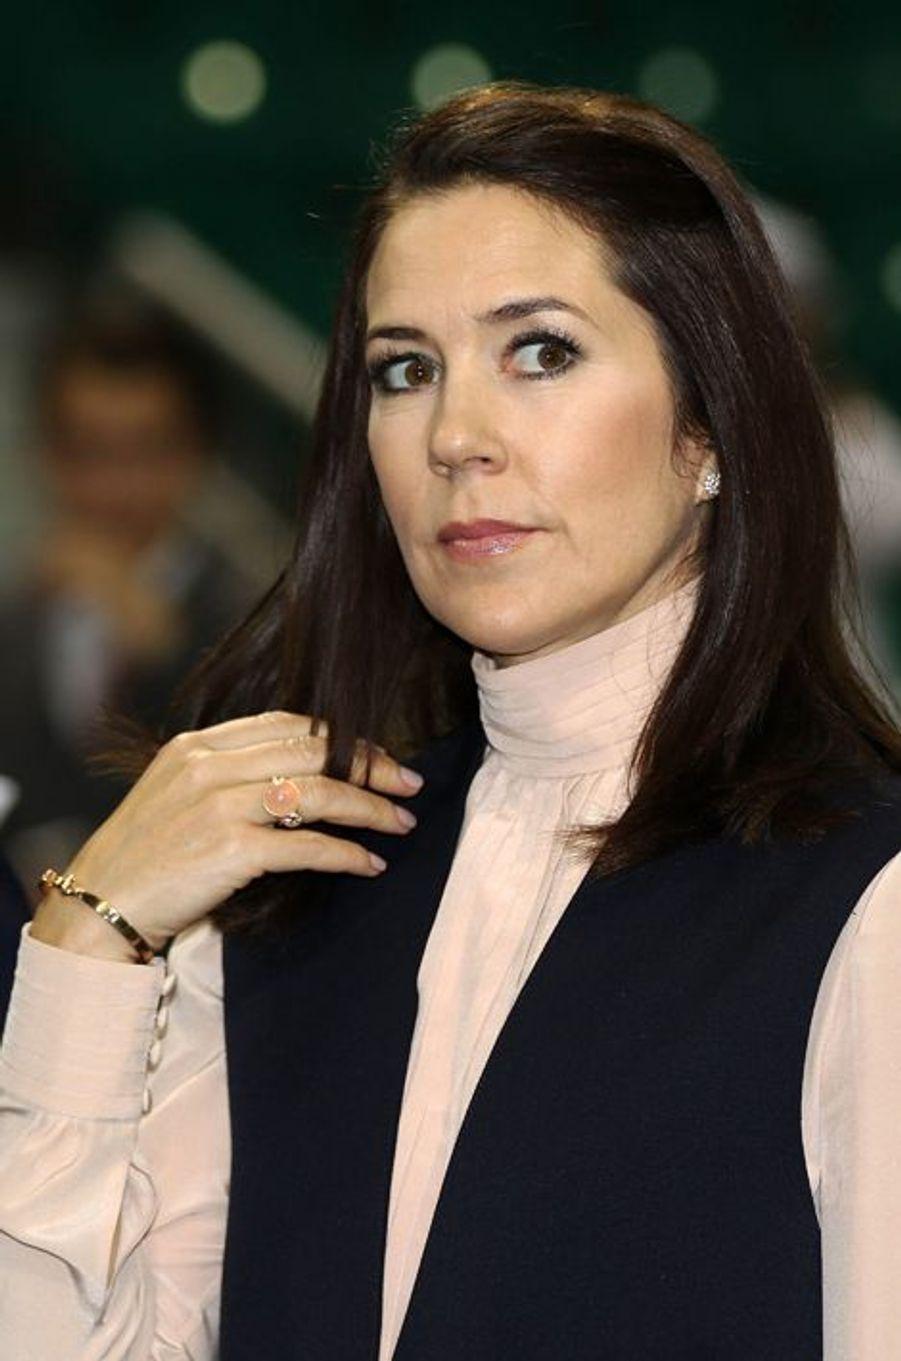 La princesse Mary de Danemark à Doha, le 2 mars 2016